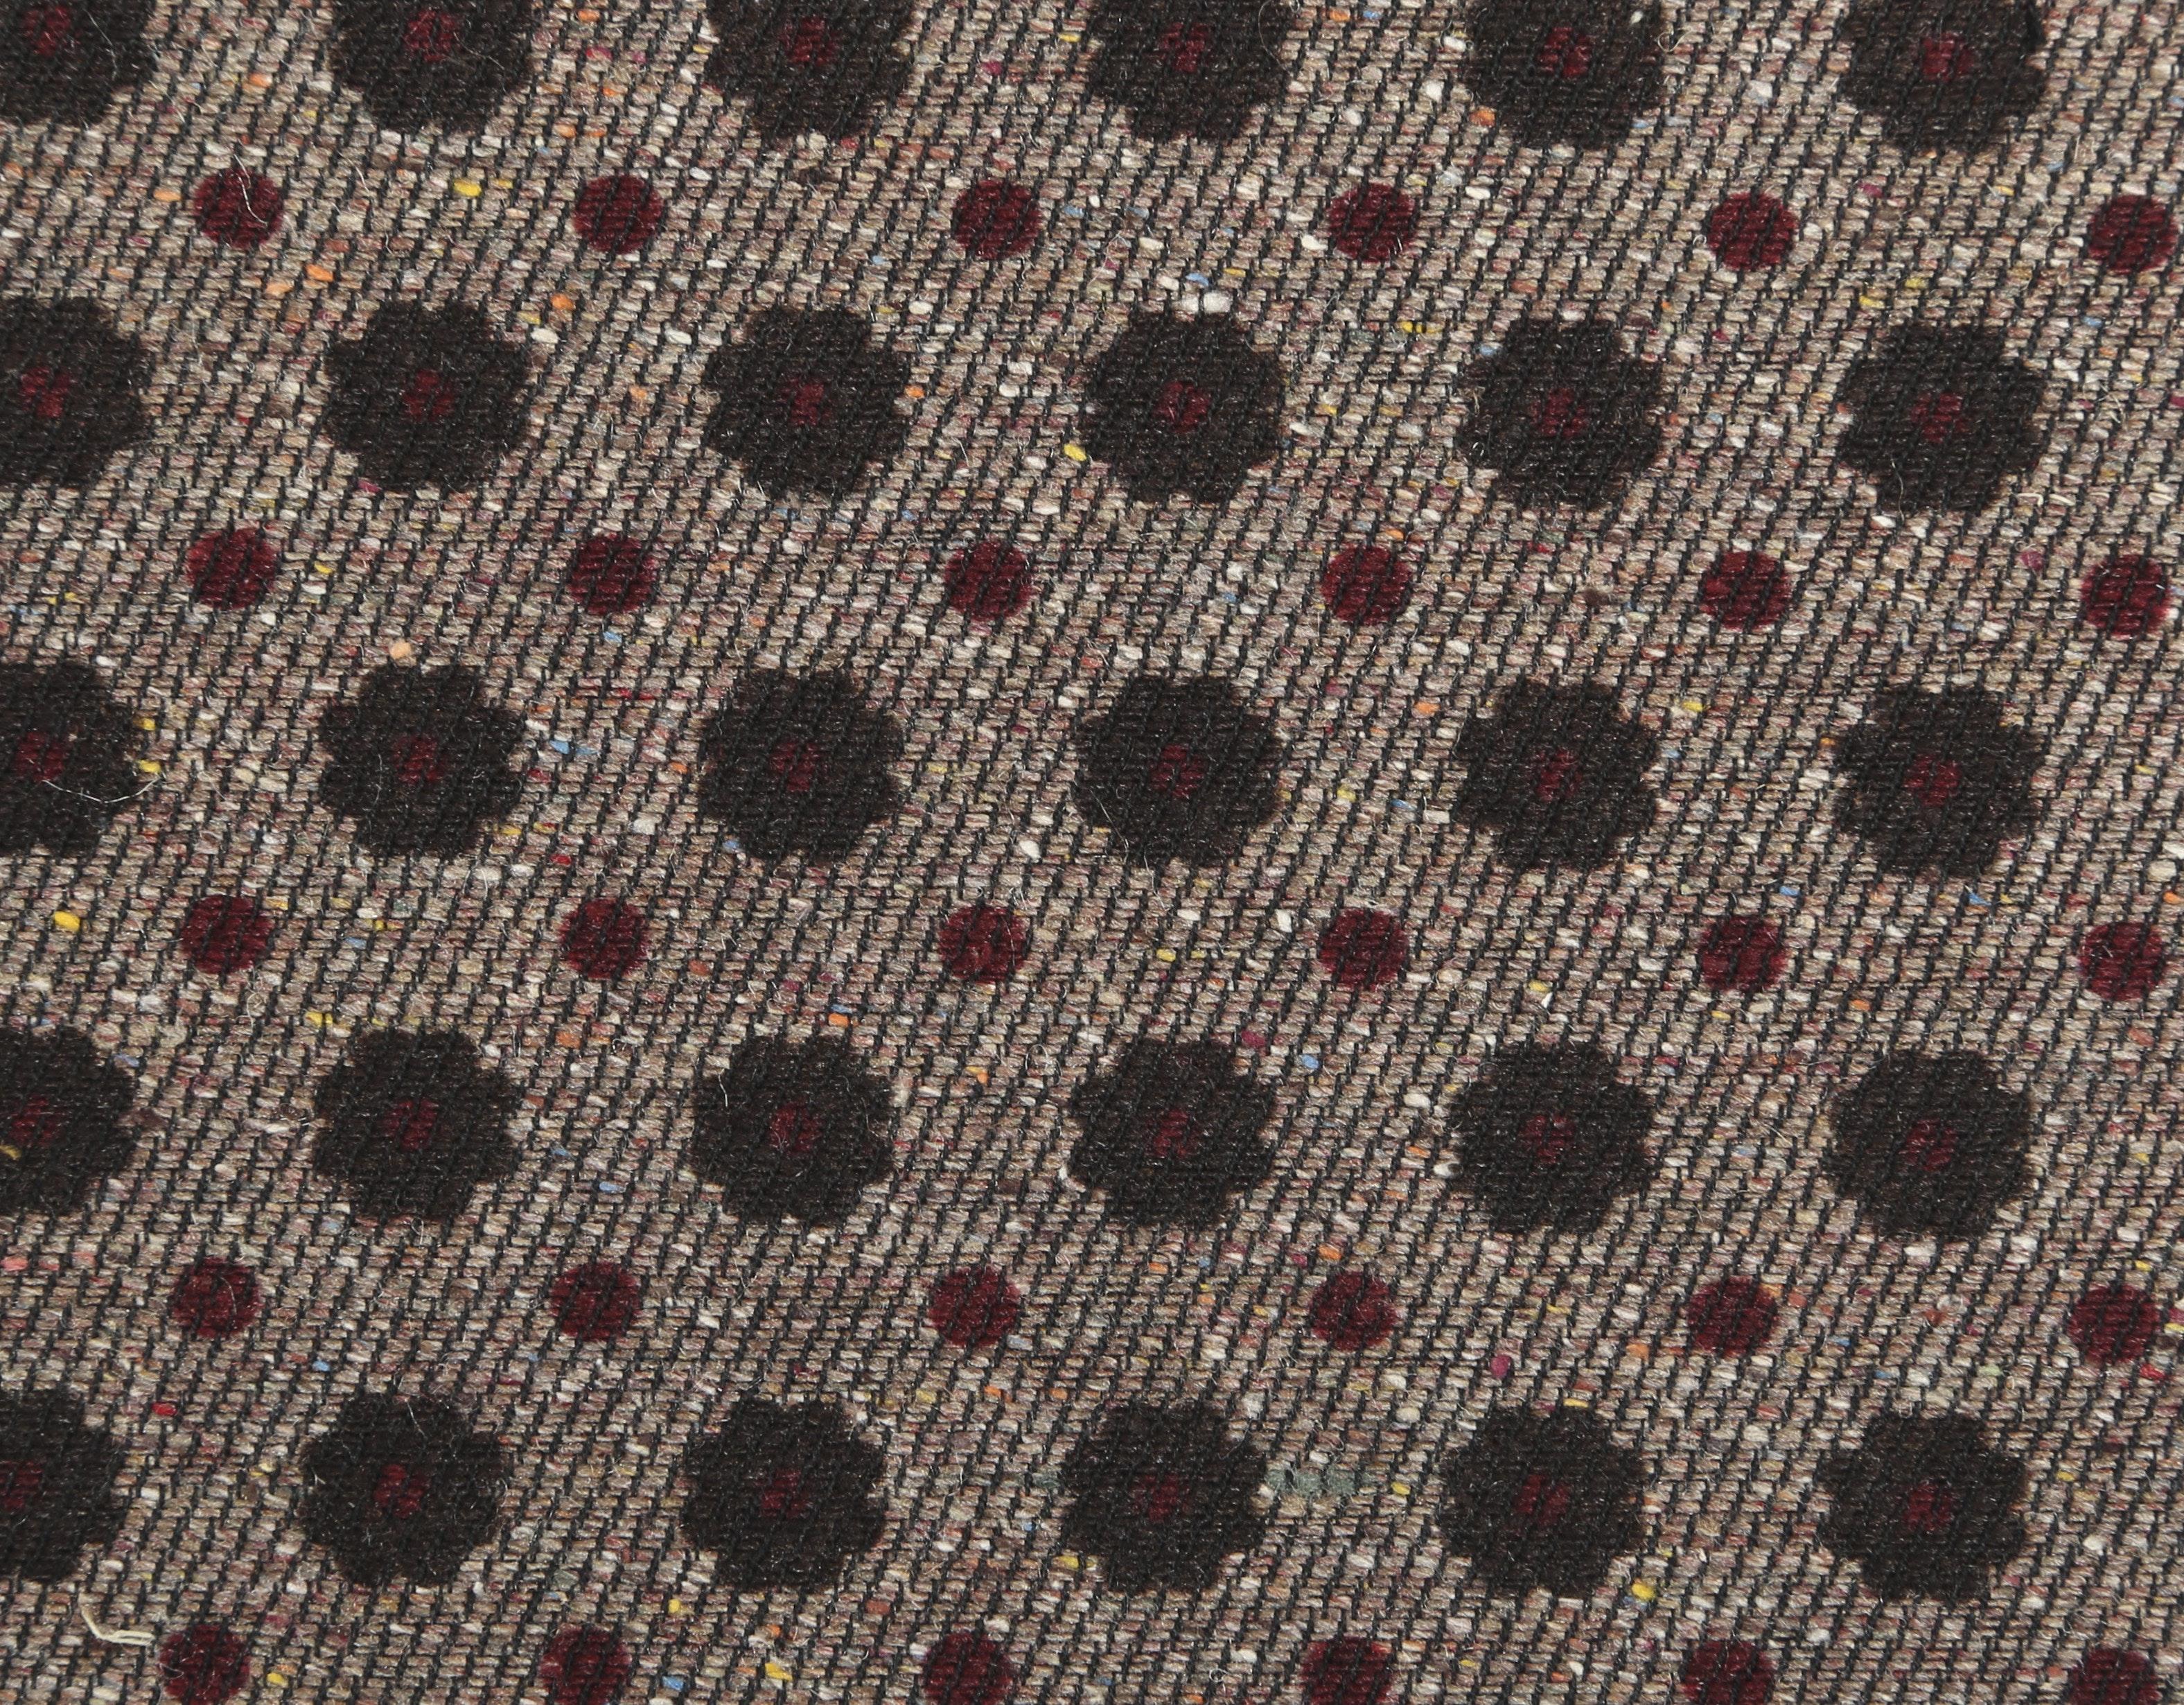 https://massdrop-s3.imgix.net/product-images/panta-cotton-silk-tie/MD-15633_20160209114819_4329e6a312911d9e.jpg?auto=format&fm=jpg&fit=crop&w=490&dpr=1